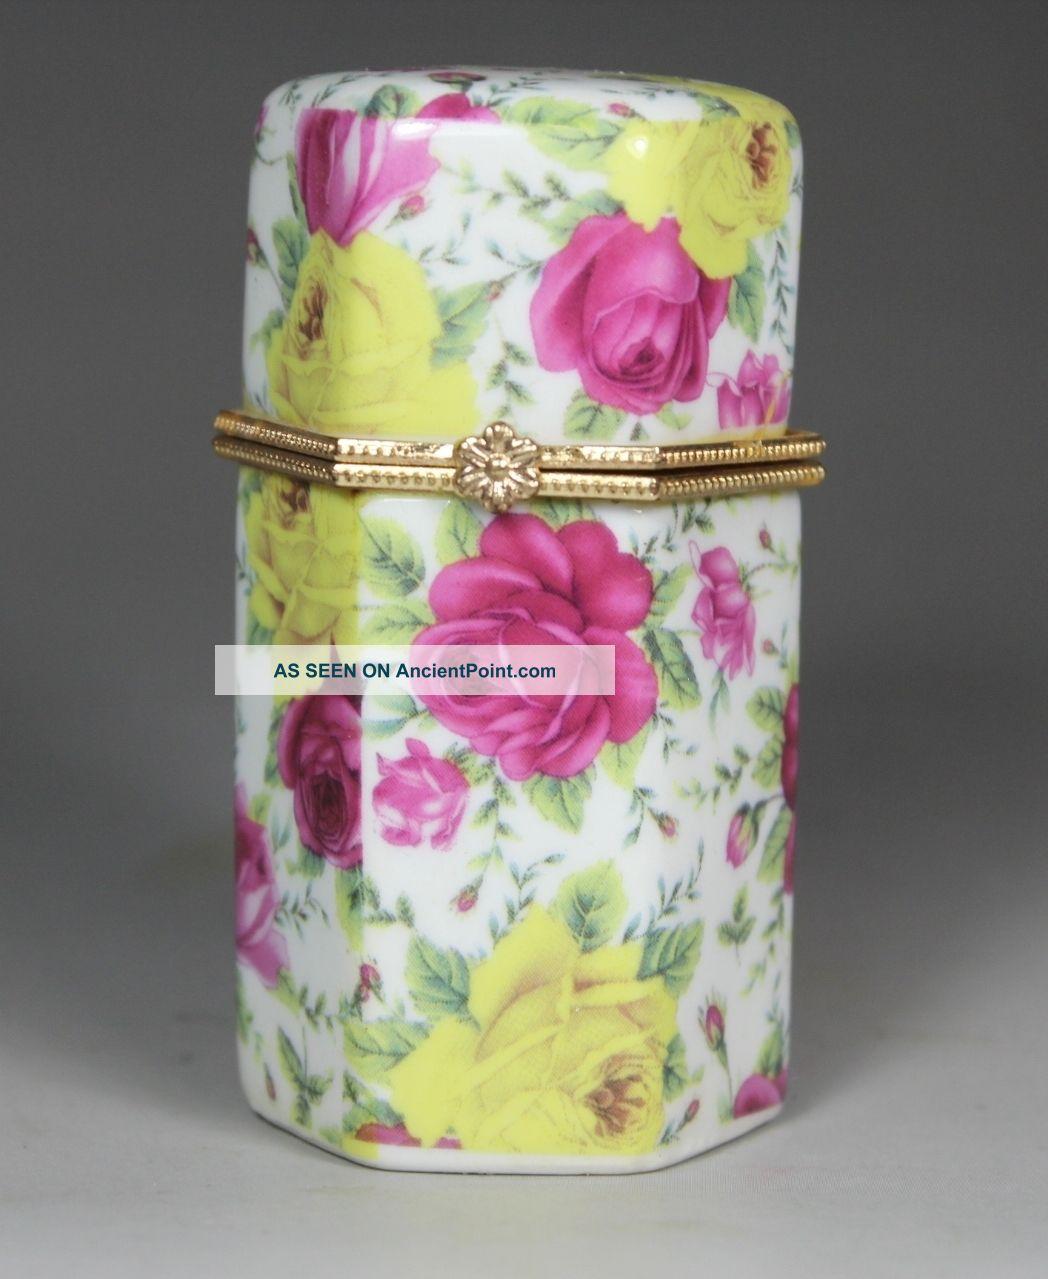 Asian Oriental Porcelain Wonderful Handwork Painting Flower Toothpick Box Boxes photo